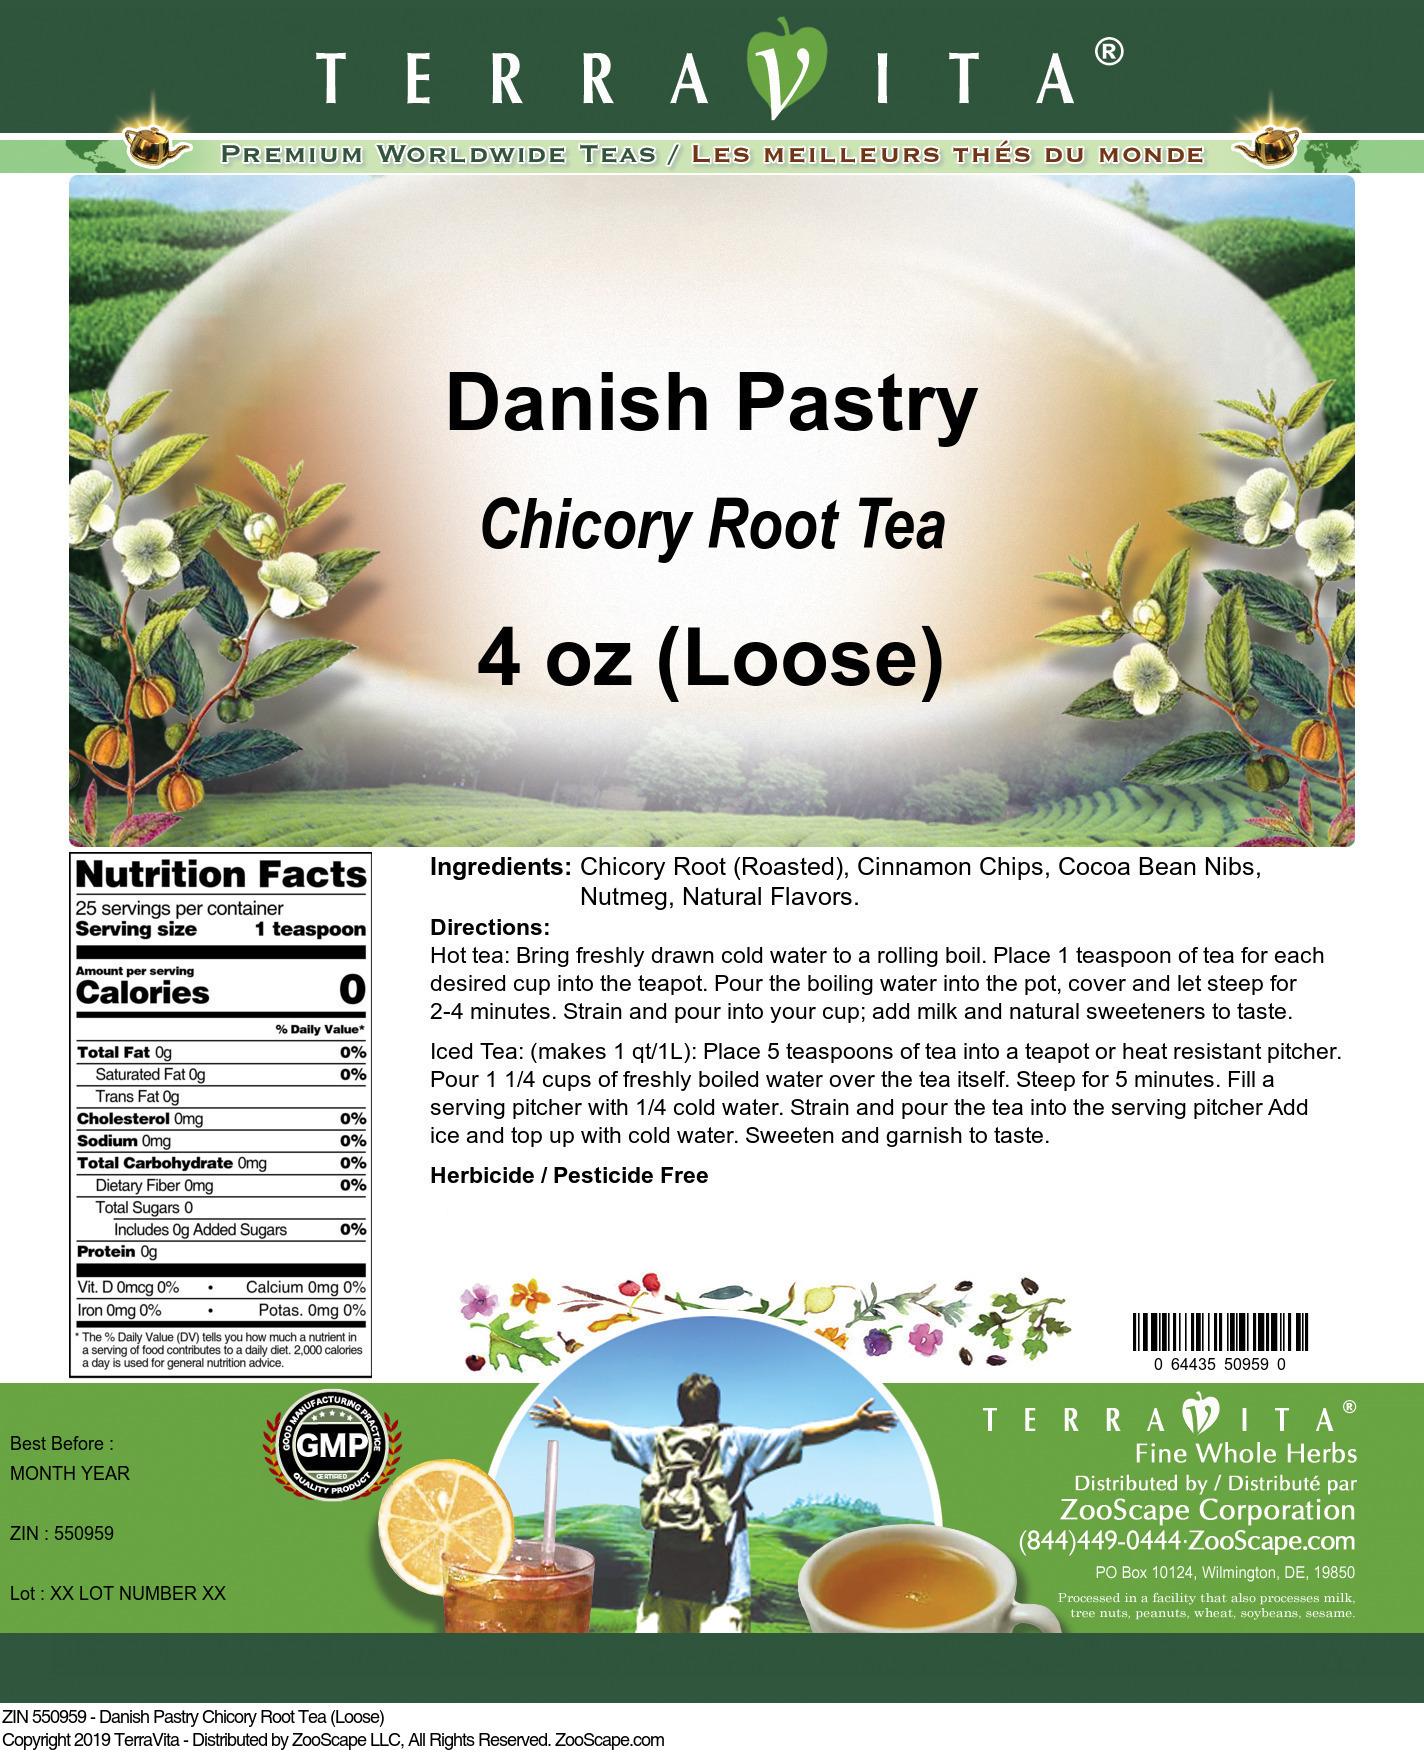 Danish Pastry Chicory Root Tea (Loose)